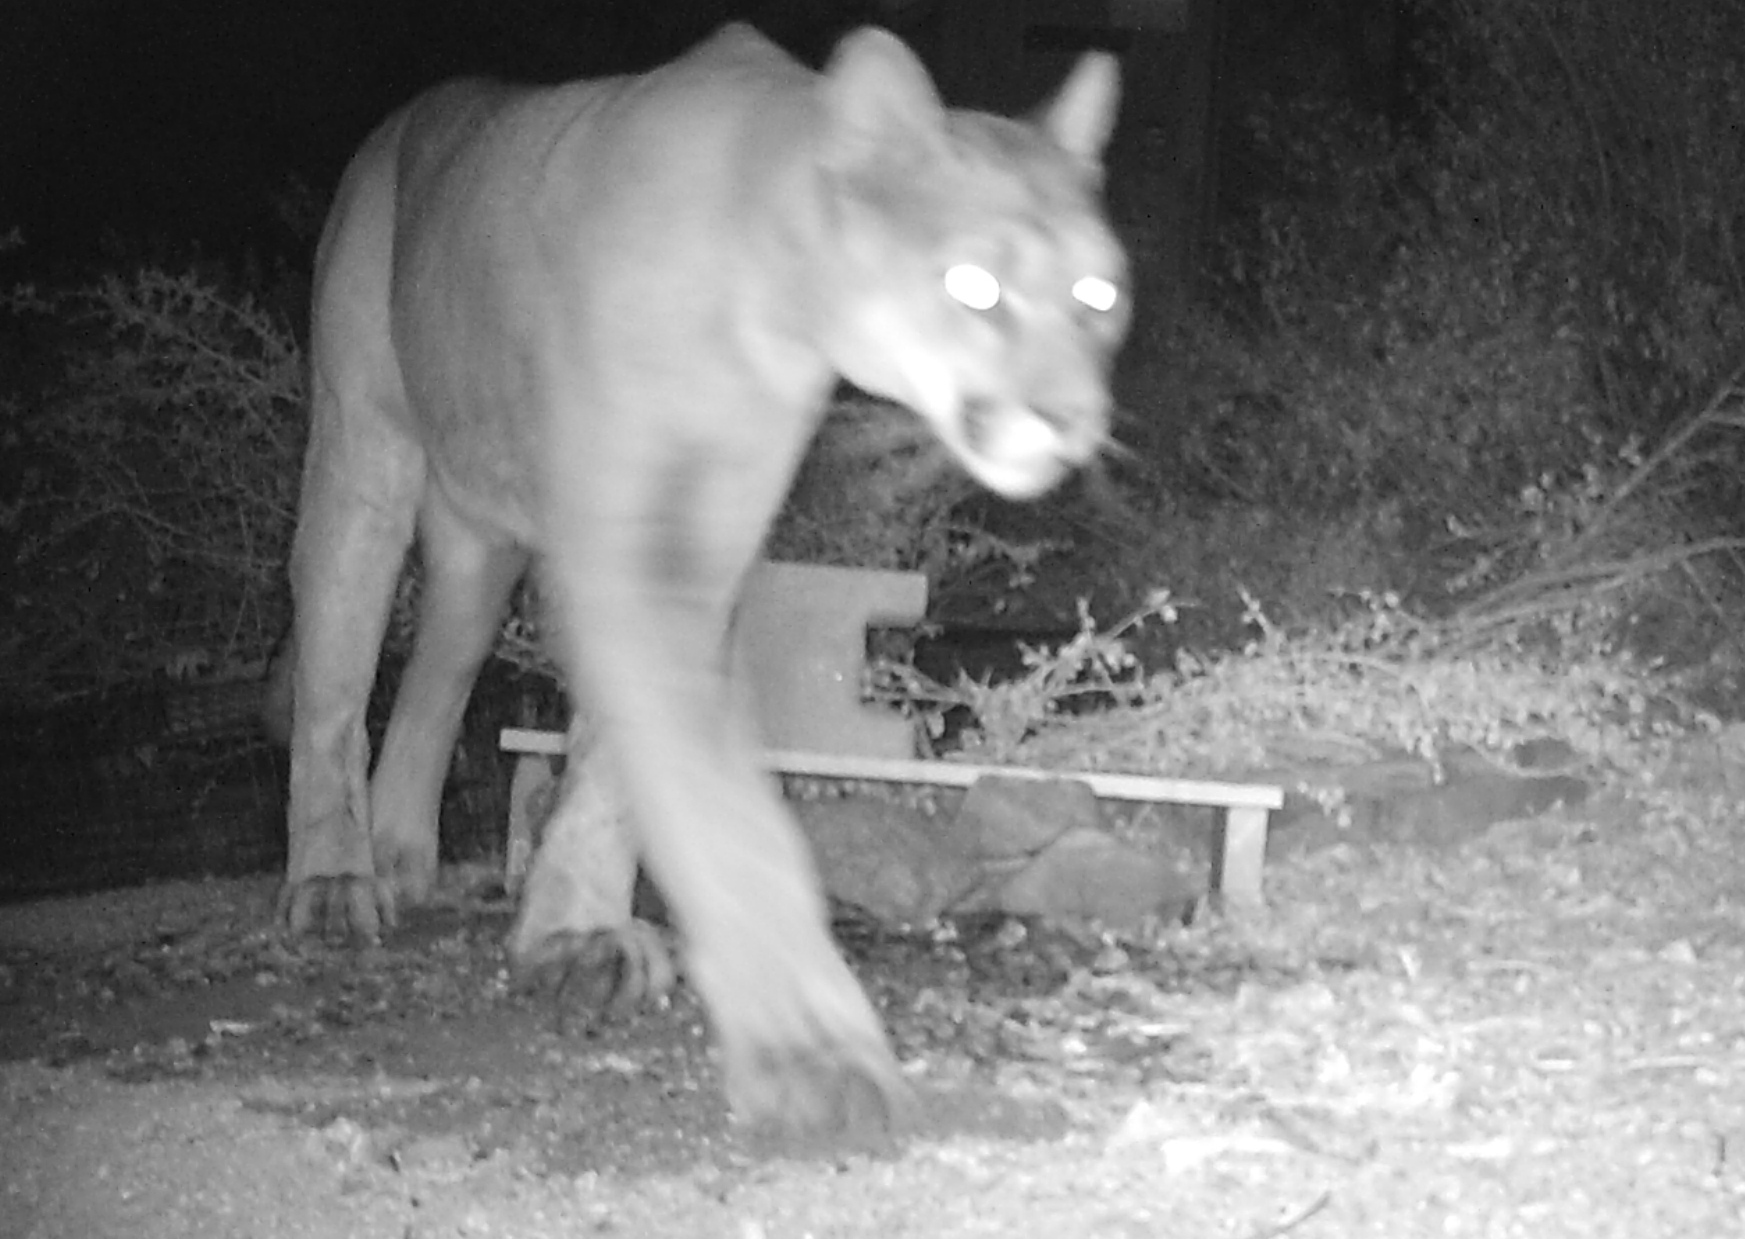 Mountain lion or puma